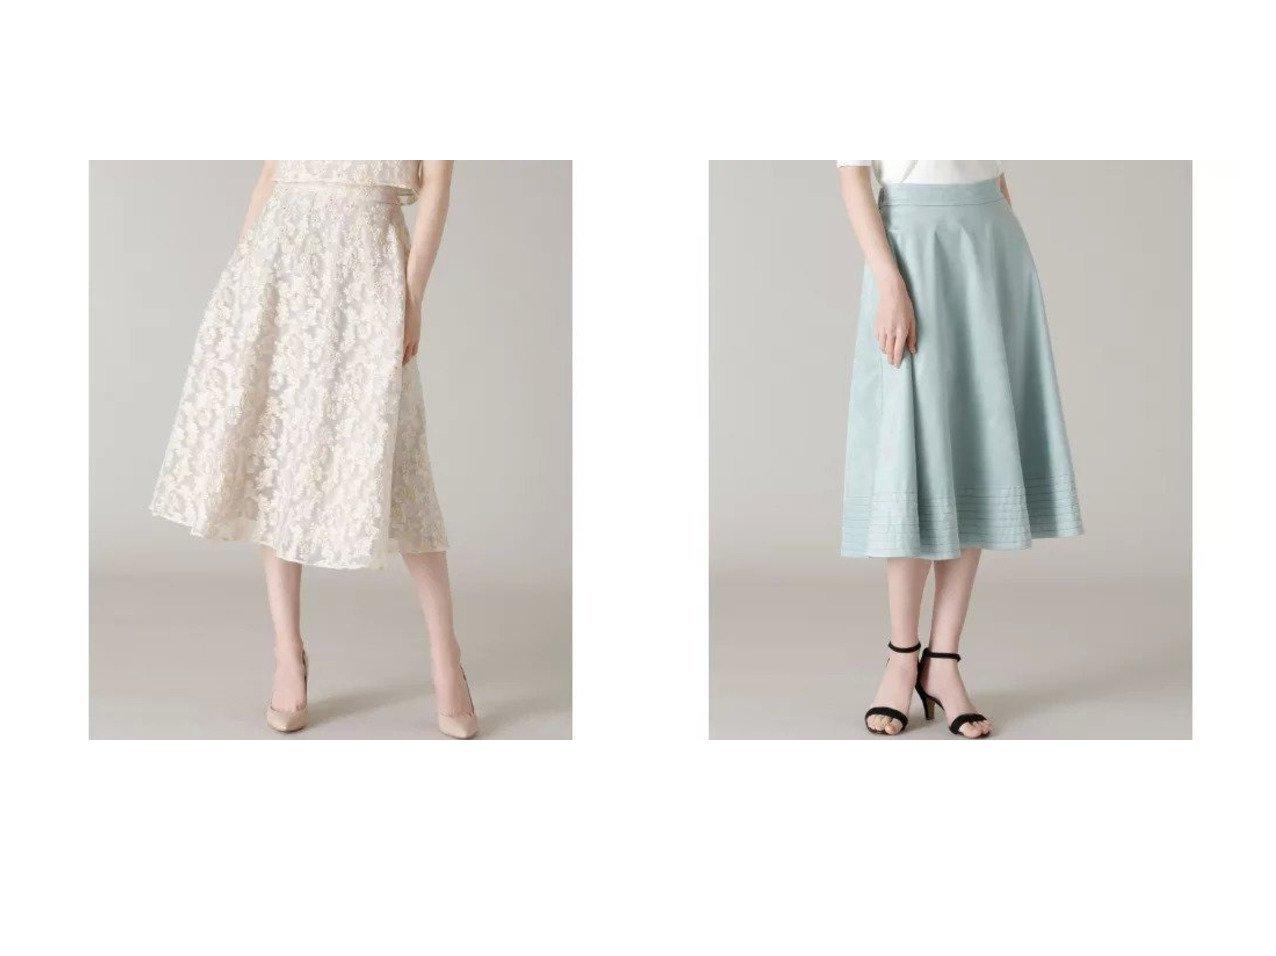 【ef-de/エフデ】の《Maglie par ef-de》フェイクスエードスカート《KOMASUEDE》&《M Maglie le cassetto》シアージャガードスカート 【スカート】おすすめ!人気、トレンド・レディースファッションの通販 おすすめで人気の流行・トレンド、ファッションの通販商品 メンズファッション・キッズファッション・インテリア・家具・レディースファッション・服の通販 founy(ファニー) https://founy.com/ ファッション Fashion レディースファッション WOMEN スカート Skirt 春 Spring シンプル スエード ストレッチ フレア ポケット イタリア エレガント オーガンジー クラシカル シルク セットアップ ネオン モチーフ |ID:crp329100000029128